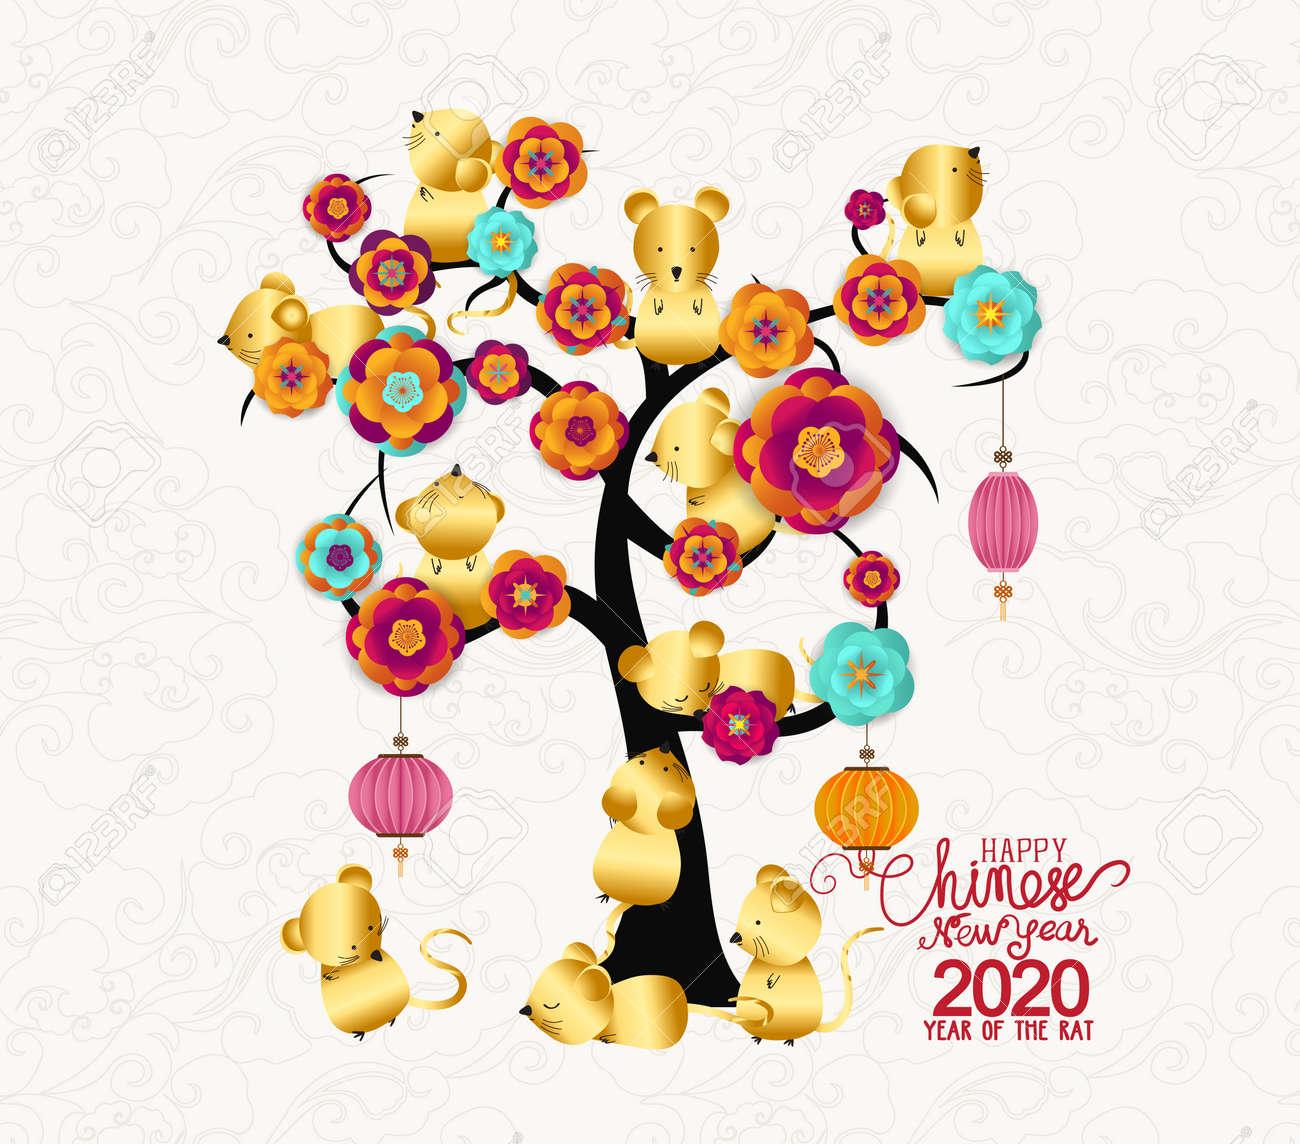 Chinese New Year 2020 Zodiac.Happy New Year 2020 Zodiac Rat Lunar New Year Tree With Blossom